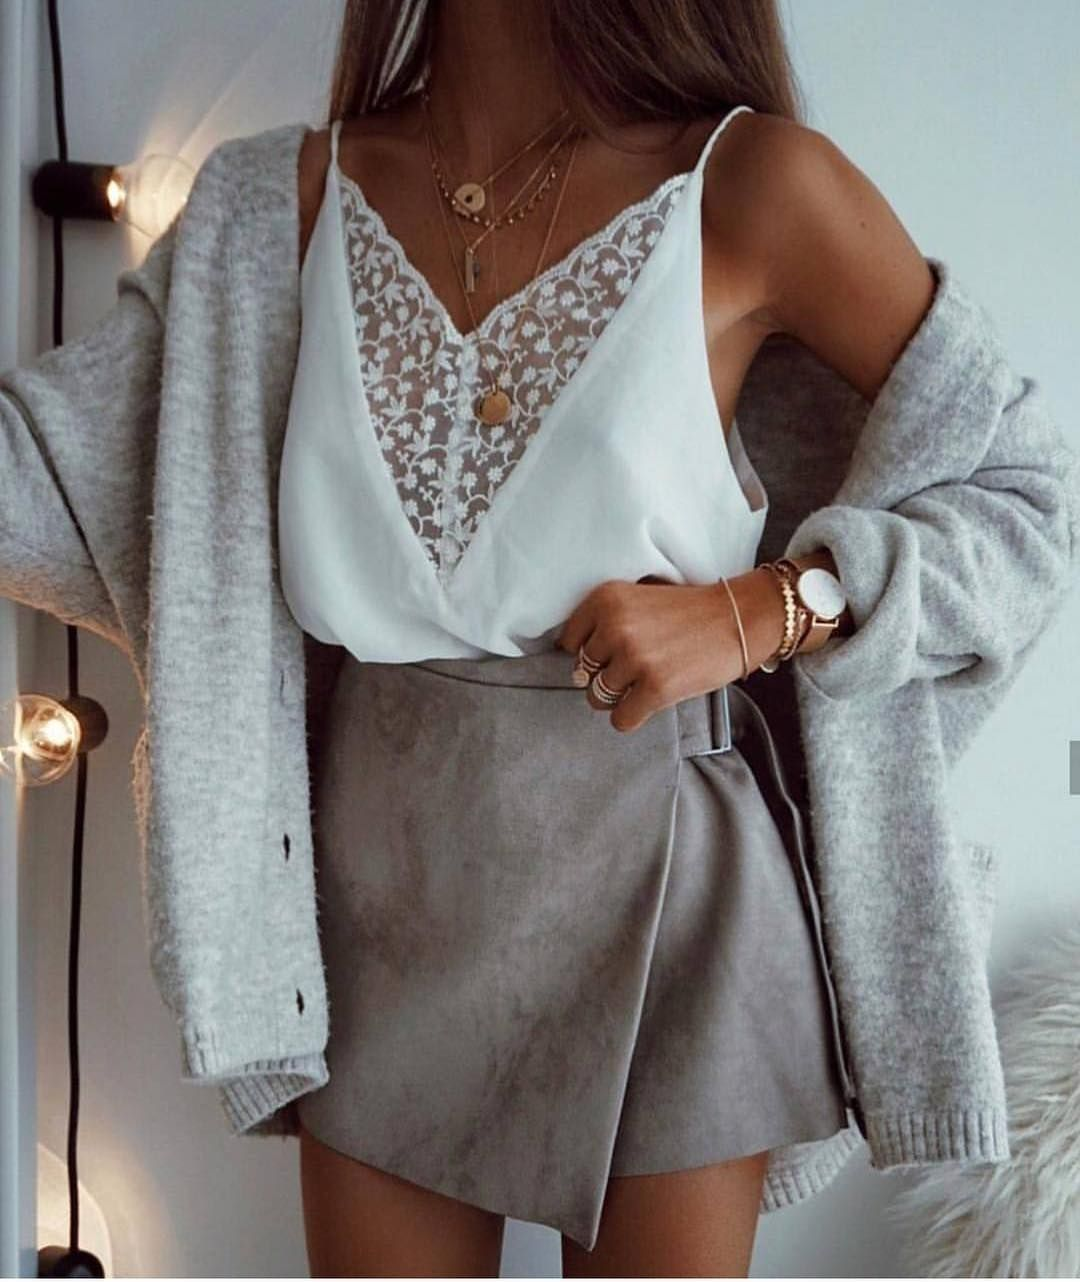 Pin by Lorie Seuylemezian on ~~Fashion~~ | Fashion ...